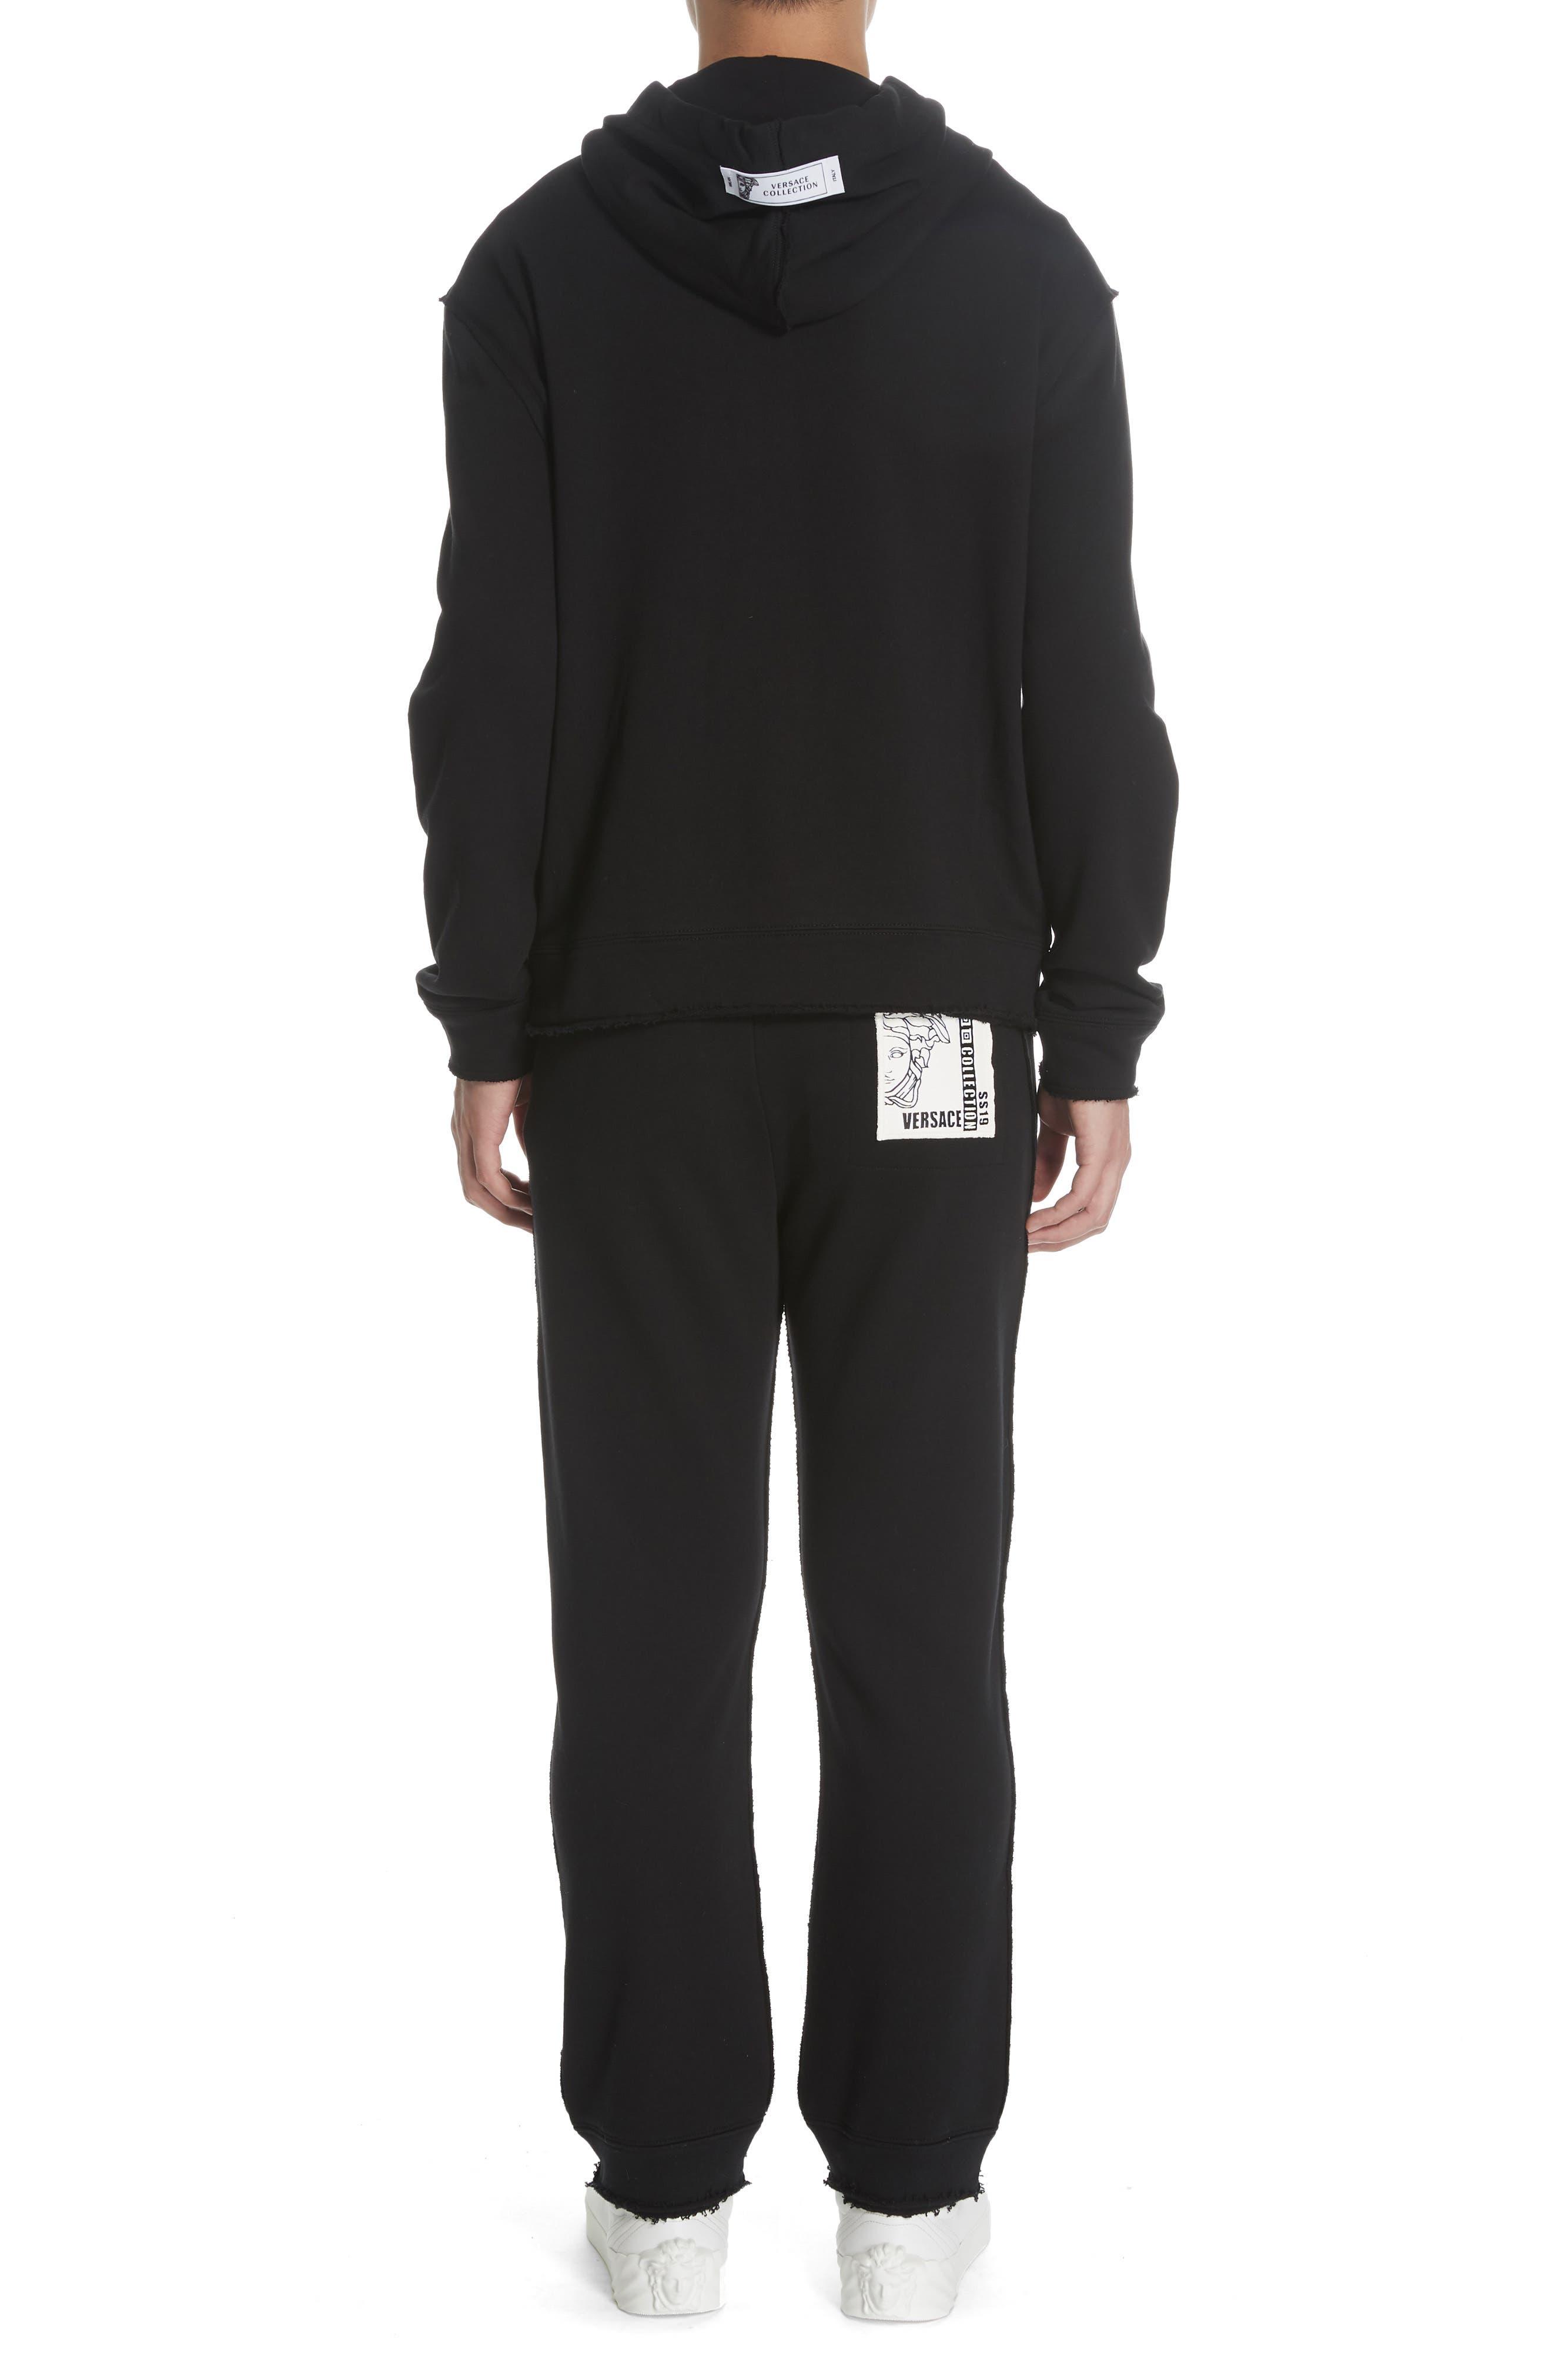 VERSACE COLLECTION, Zip Hoodie & Track Pants Set, Alternate thumbnail 3, color, BLACK